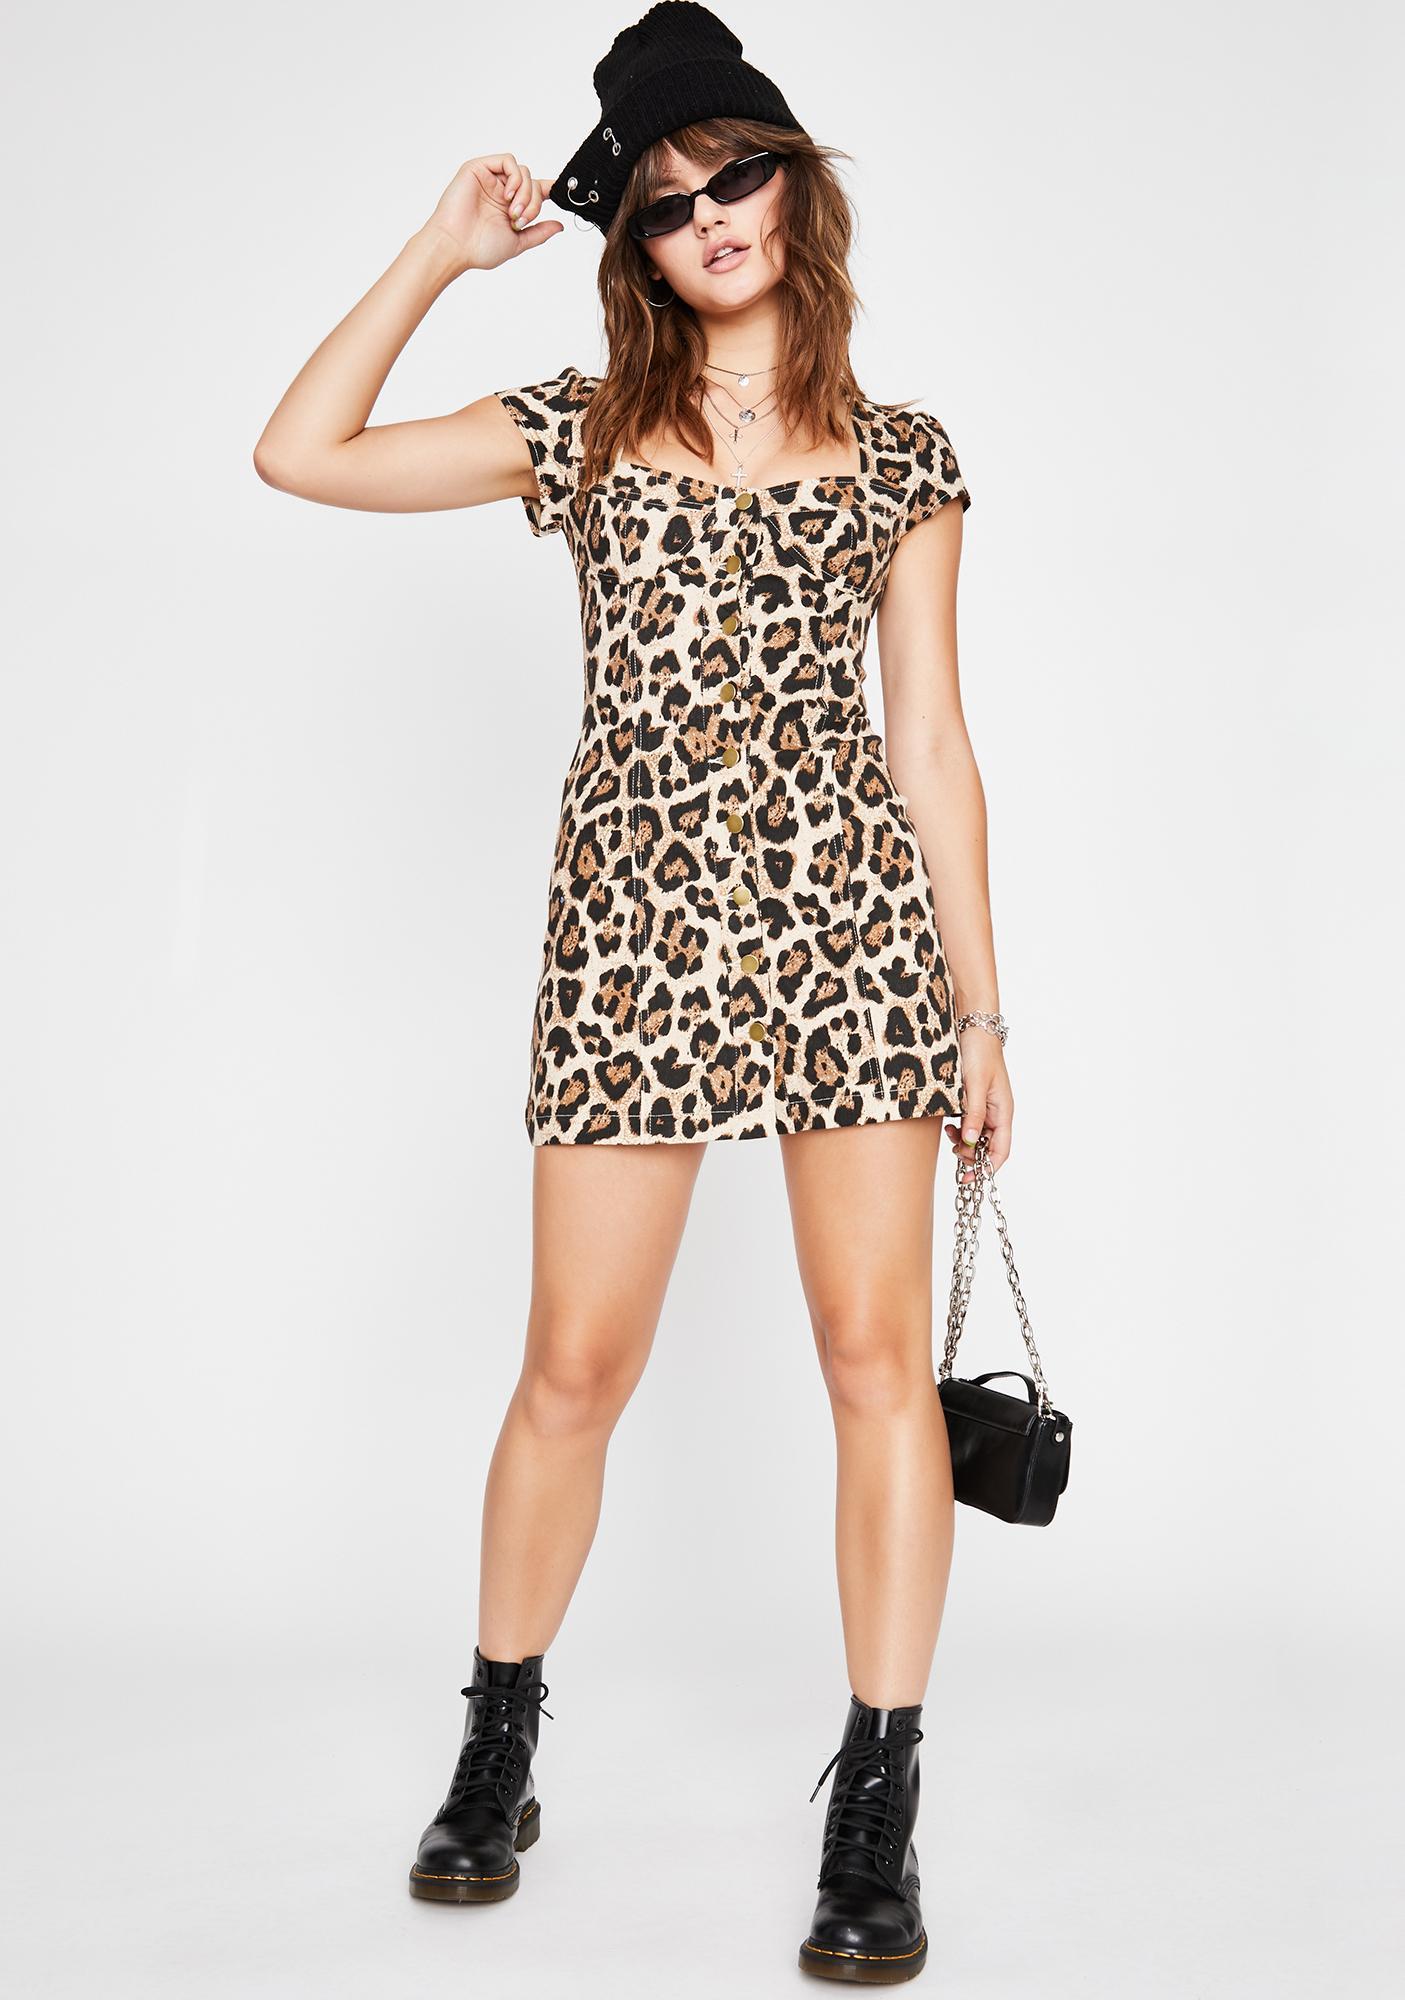 Queen Of Fierce Leopard Dress